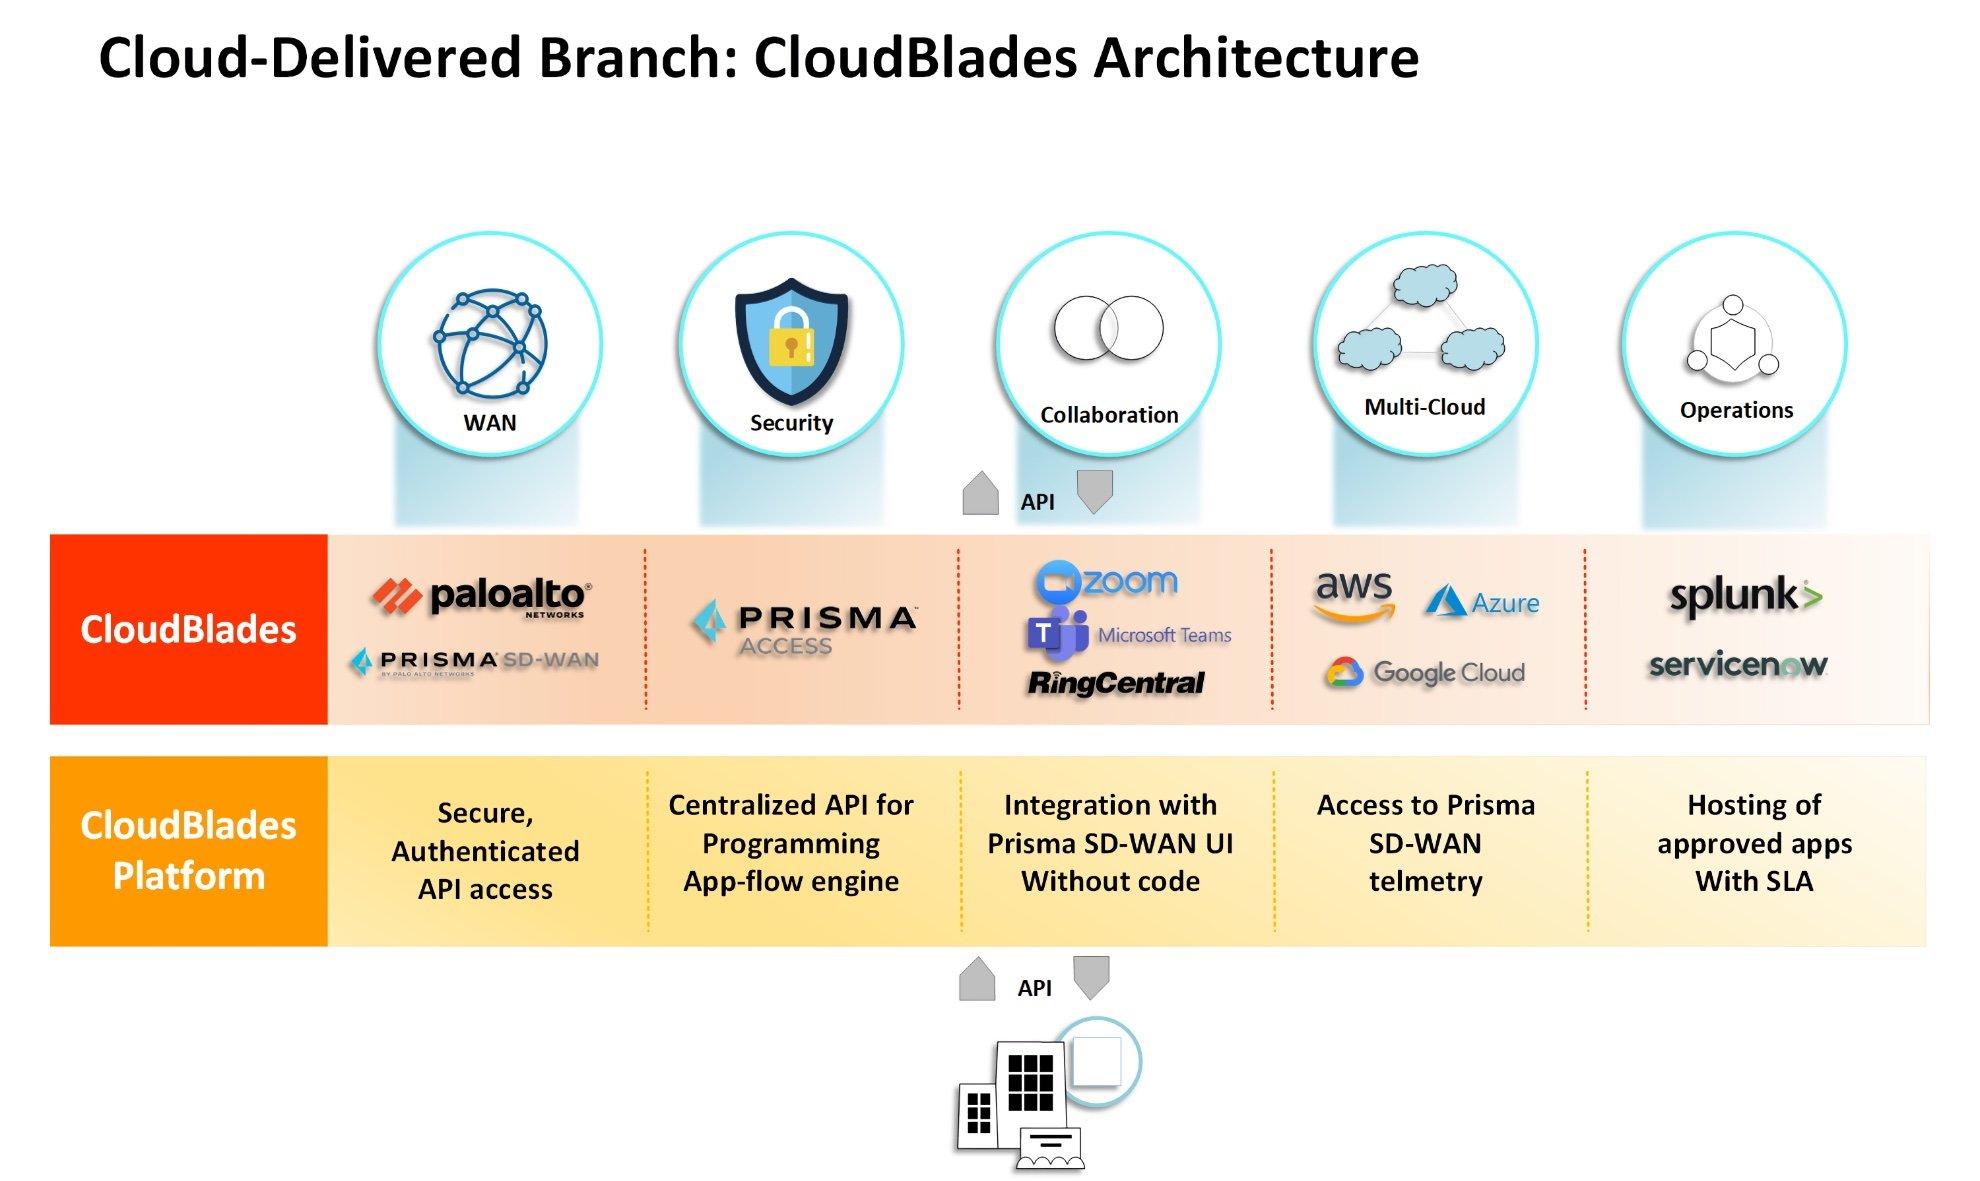 CloudBlades Architecture